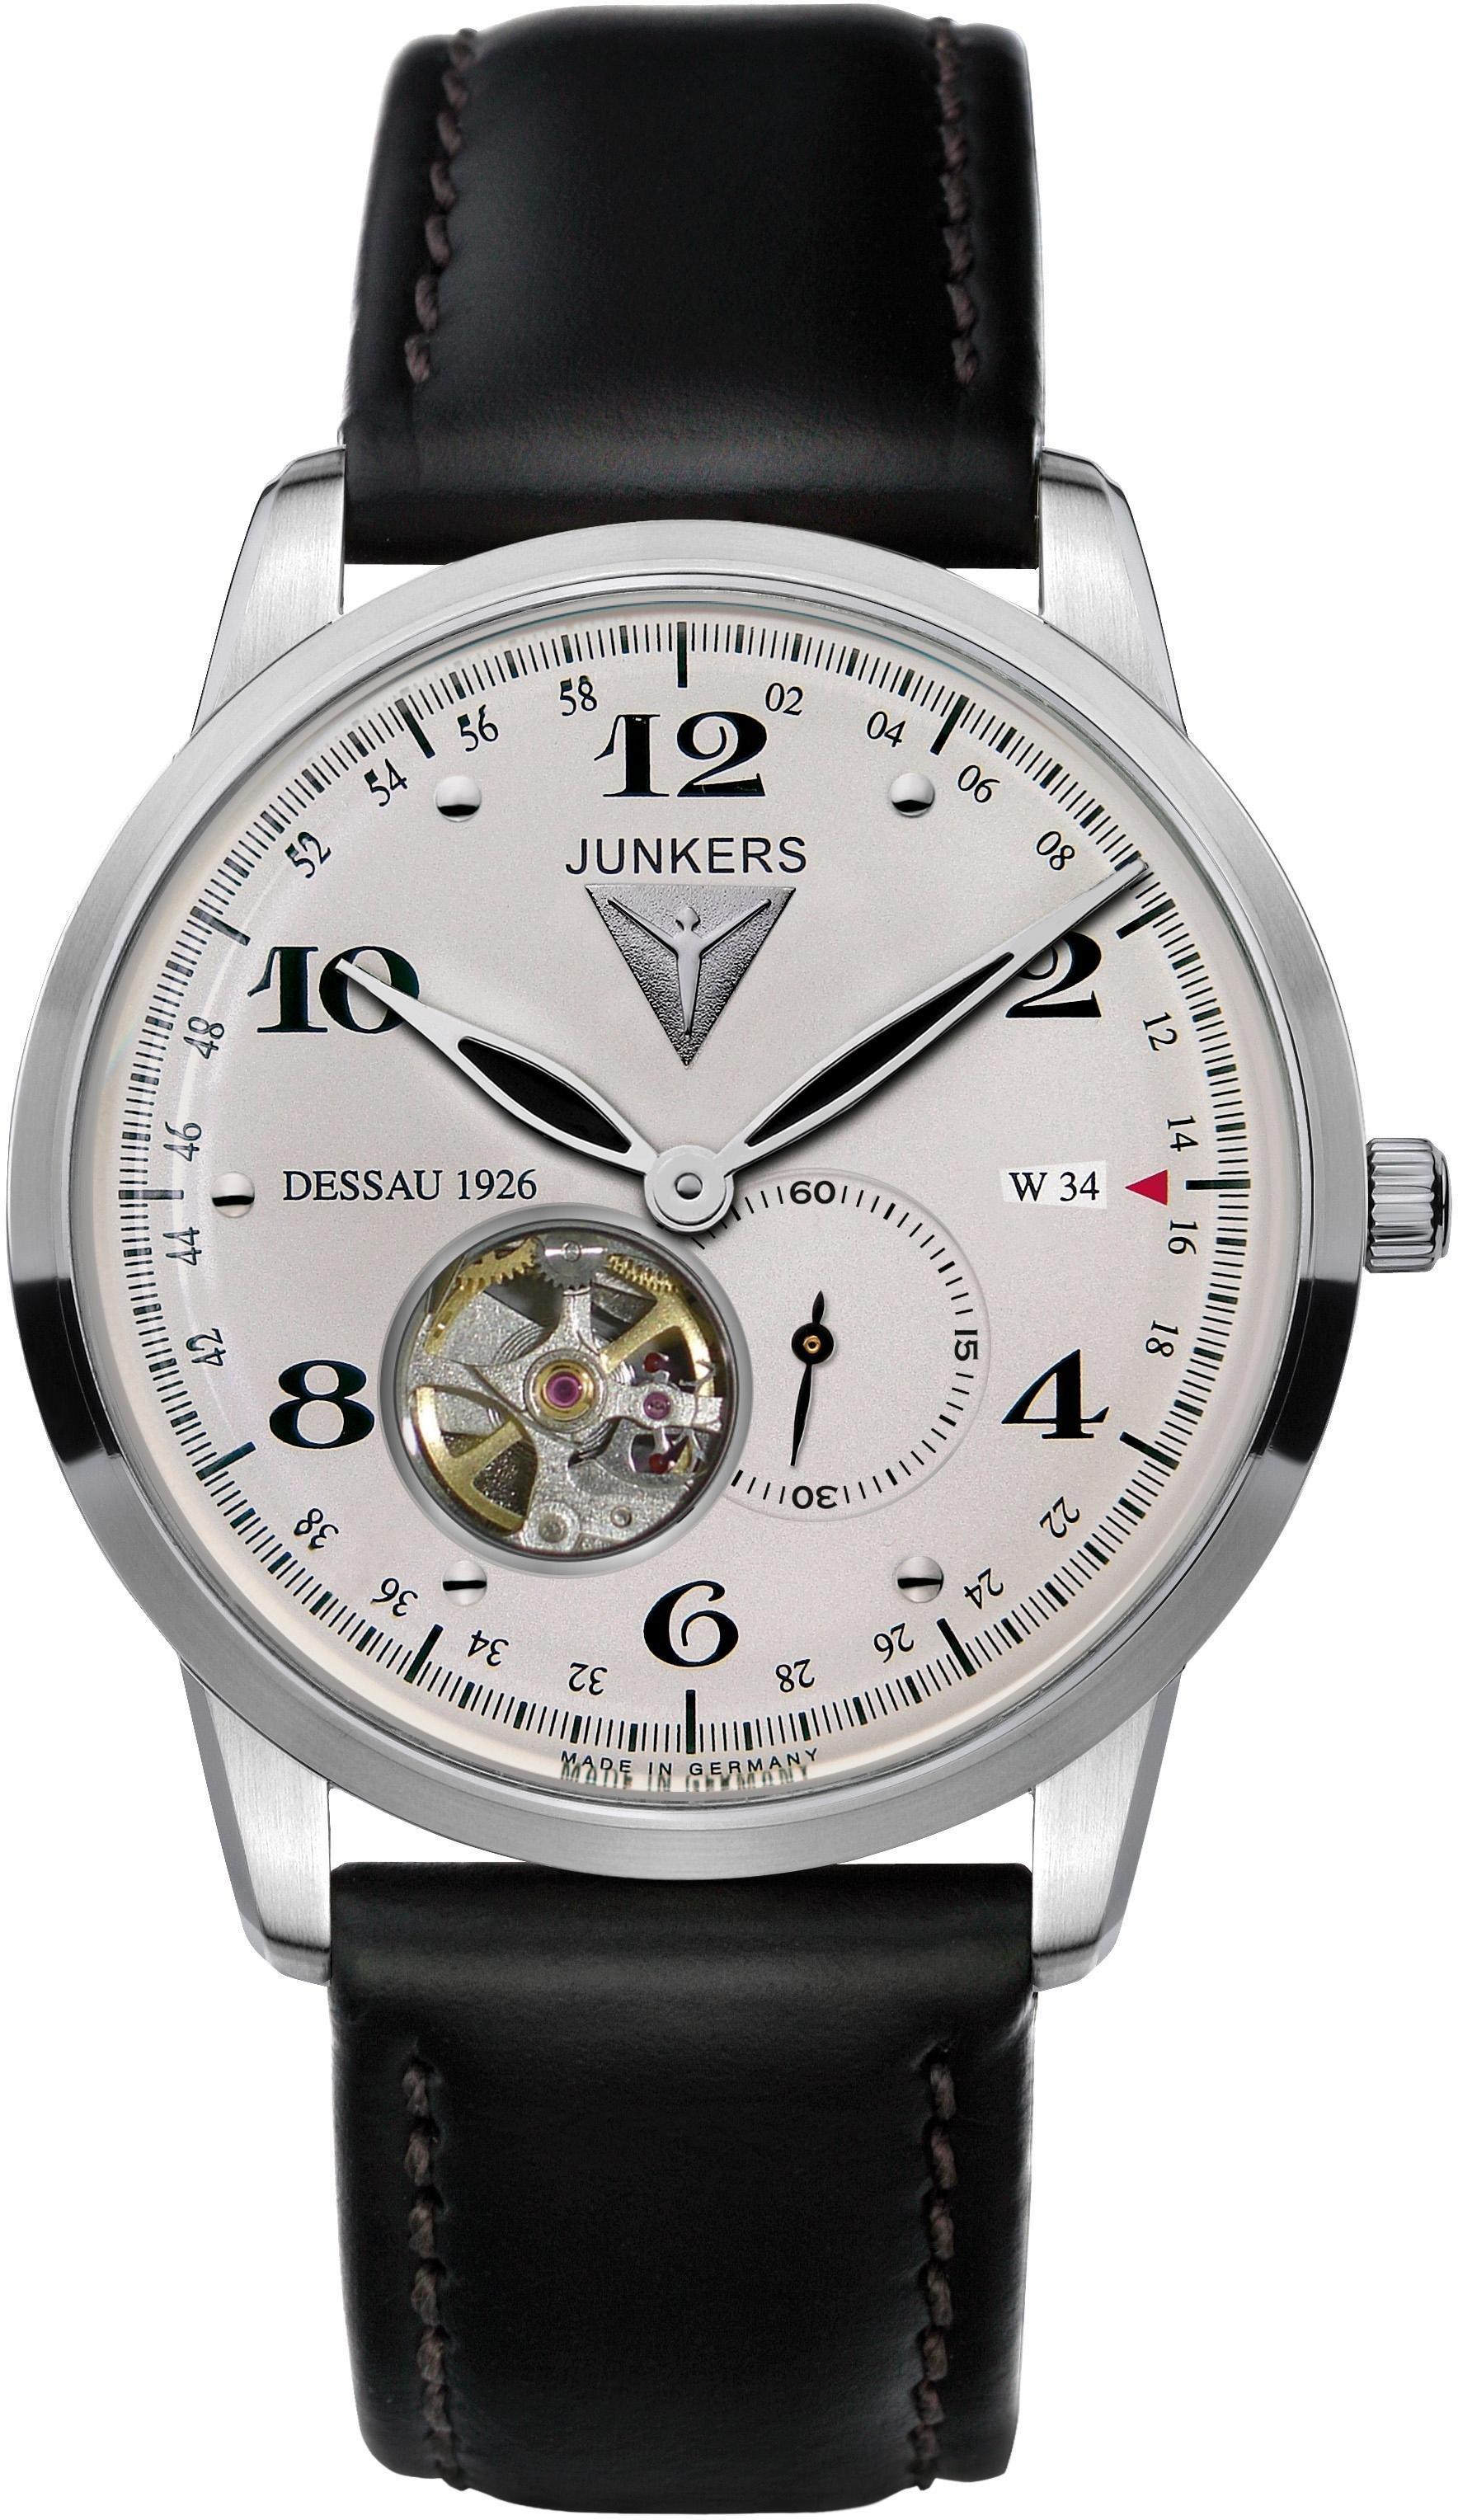 Junkers-Uhren Automatikuhr Junkers Dessau 1926 Flatline 6360-4